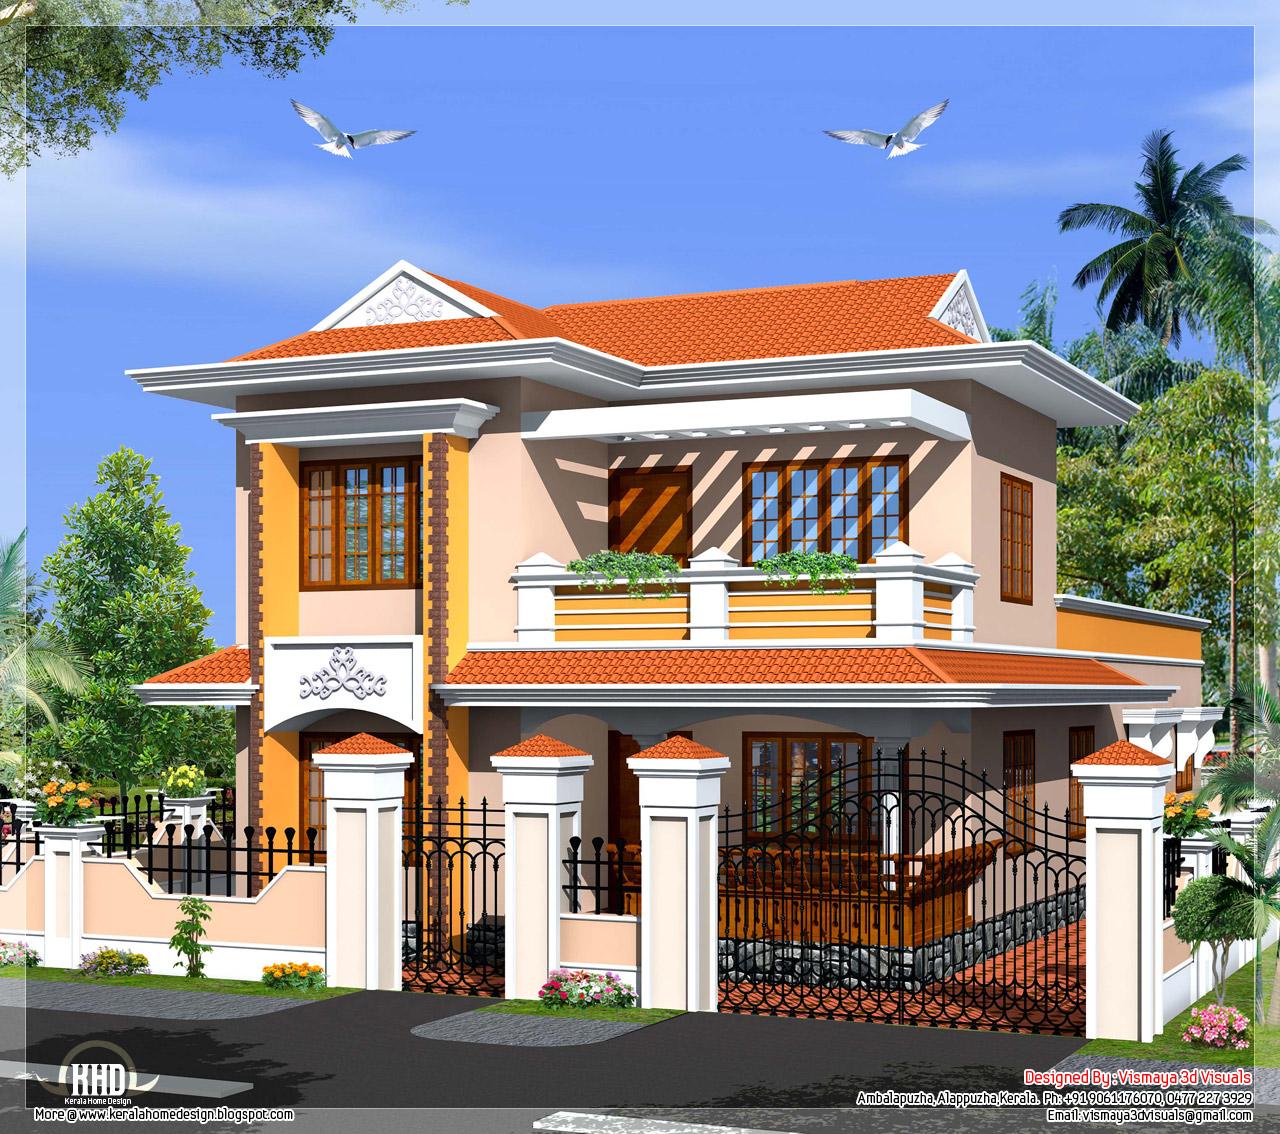 Architecture Design Kerala Model simple architecture design kerala model western style villa at